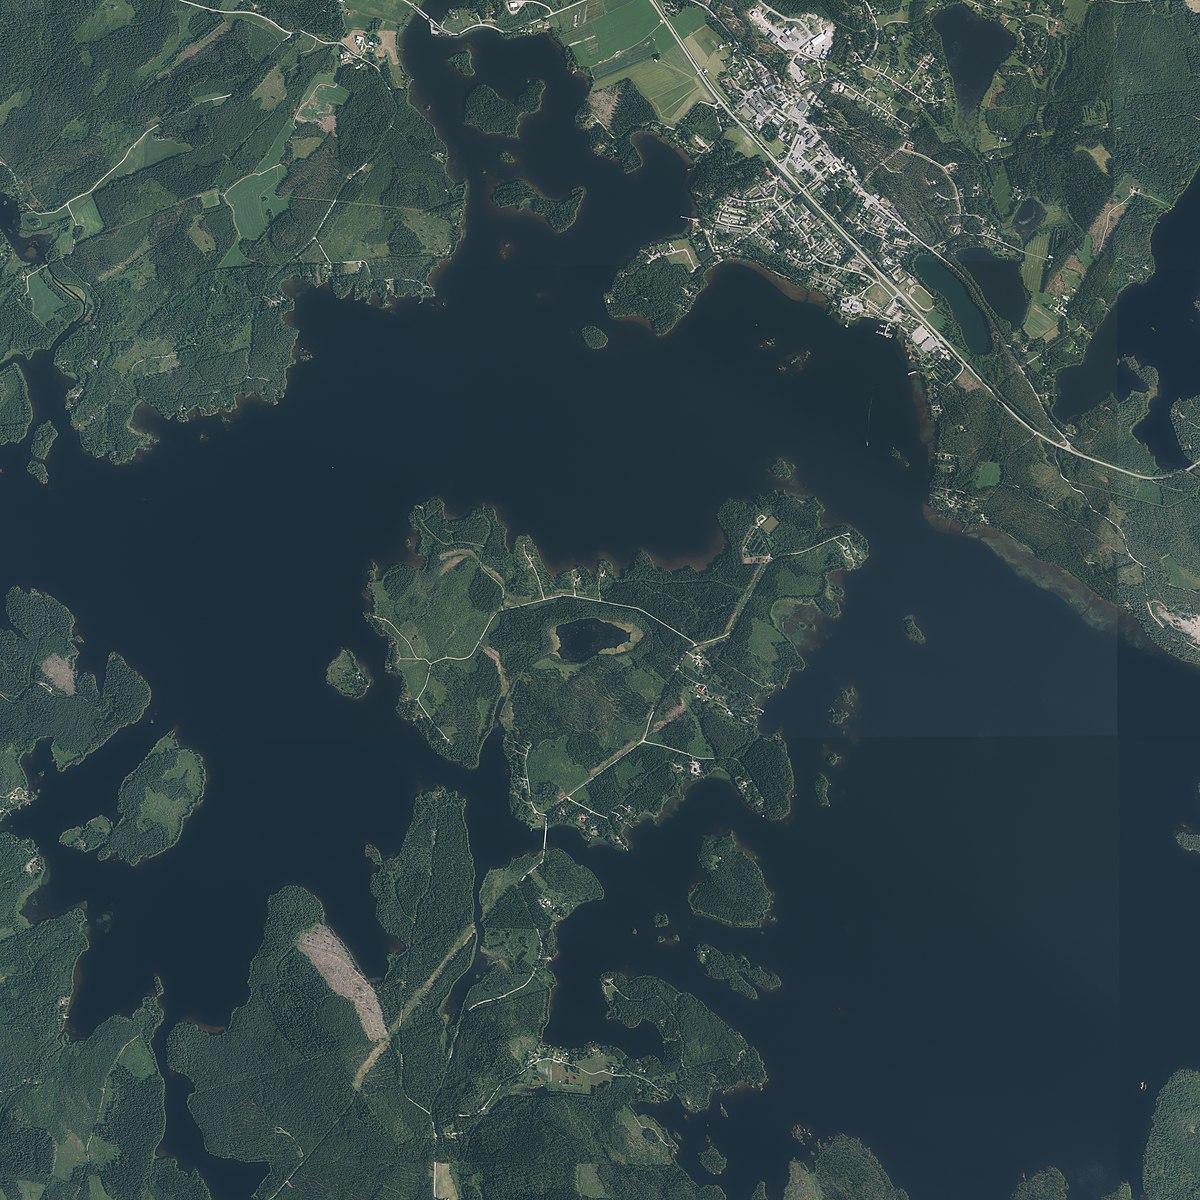 File Tuusniemi Aerial Photo Nls Jpg Wikimedia Commons